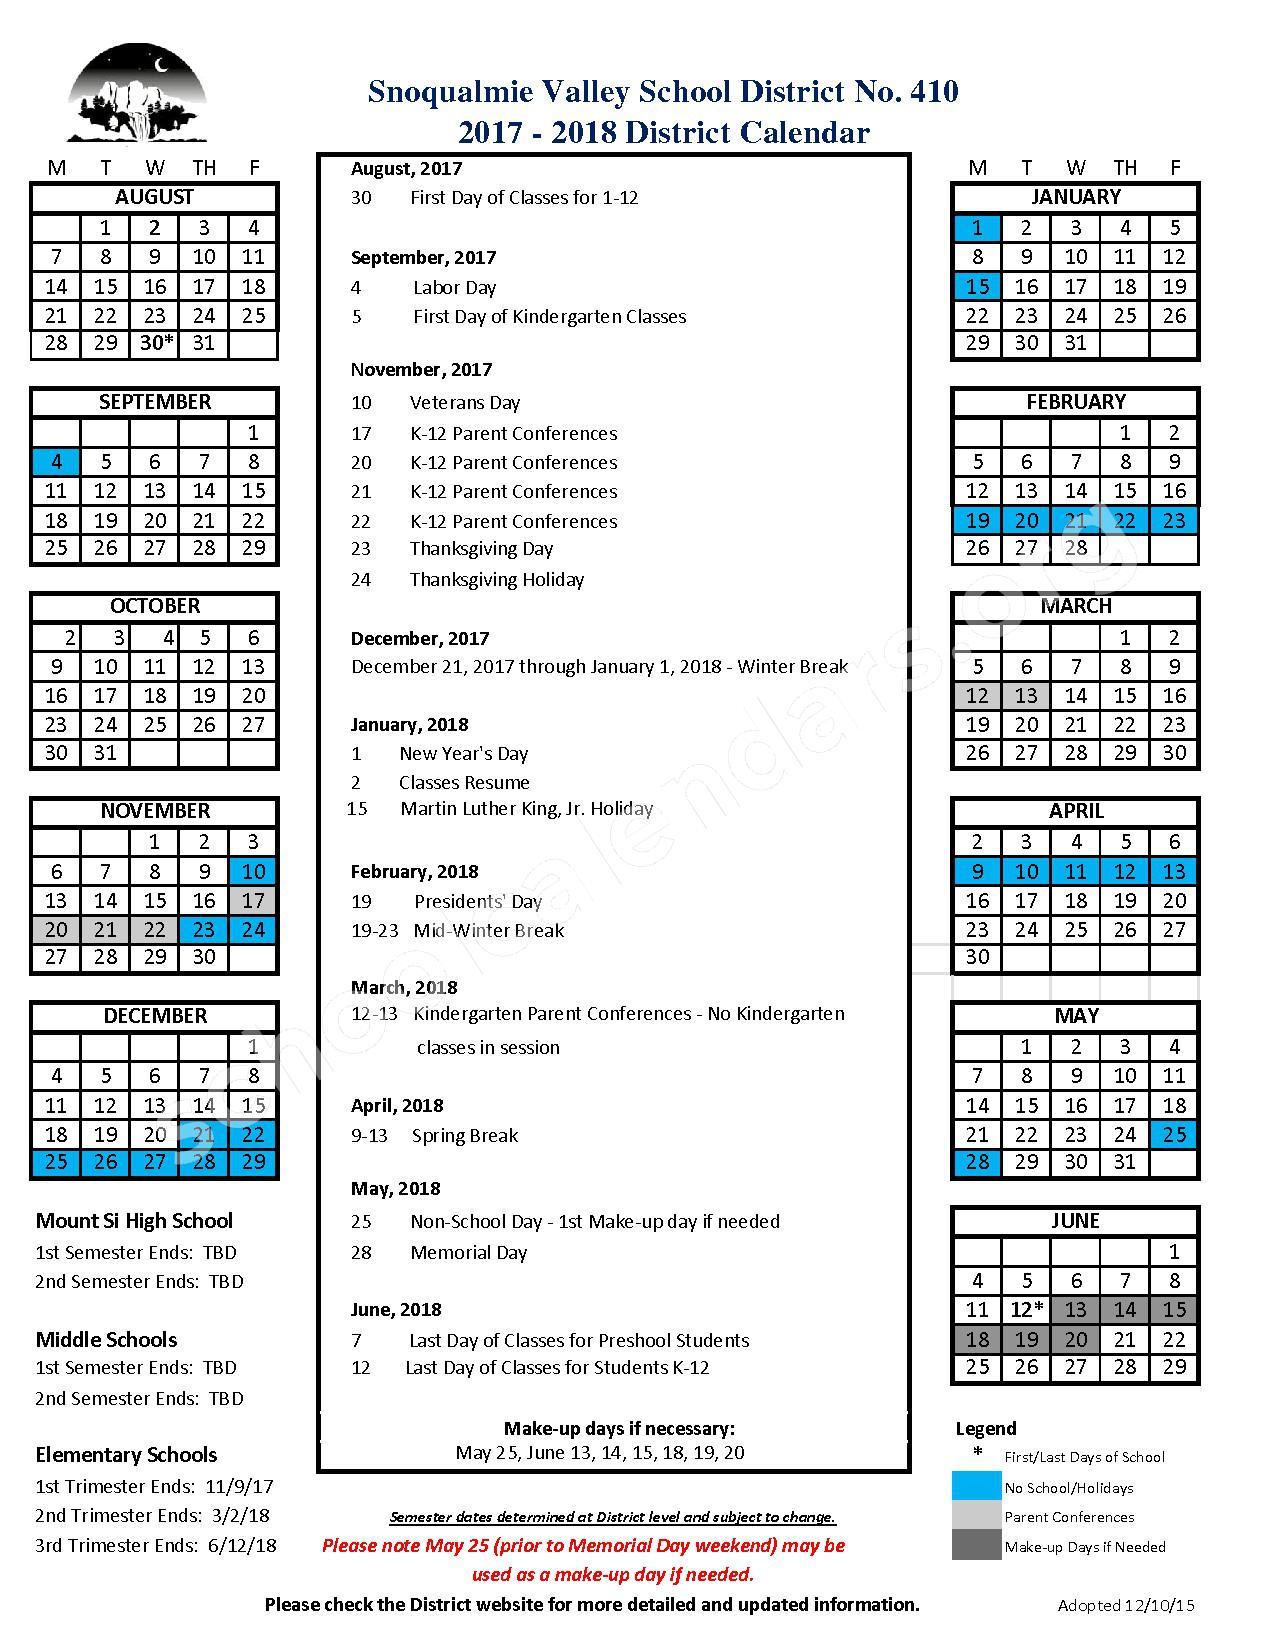 2017-2018 District Calendar – Snoqualmie Valley School District – page 1